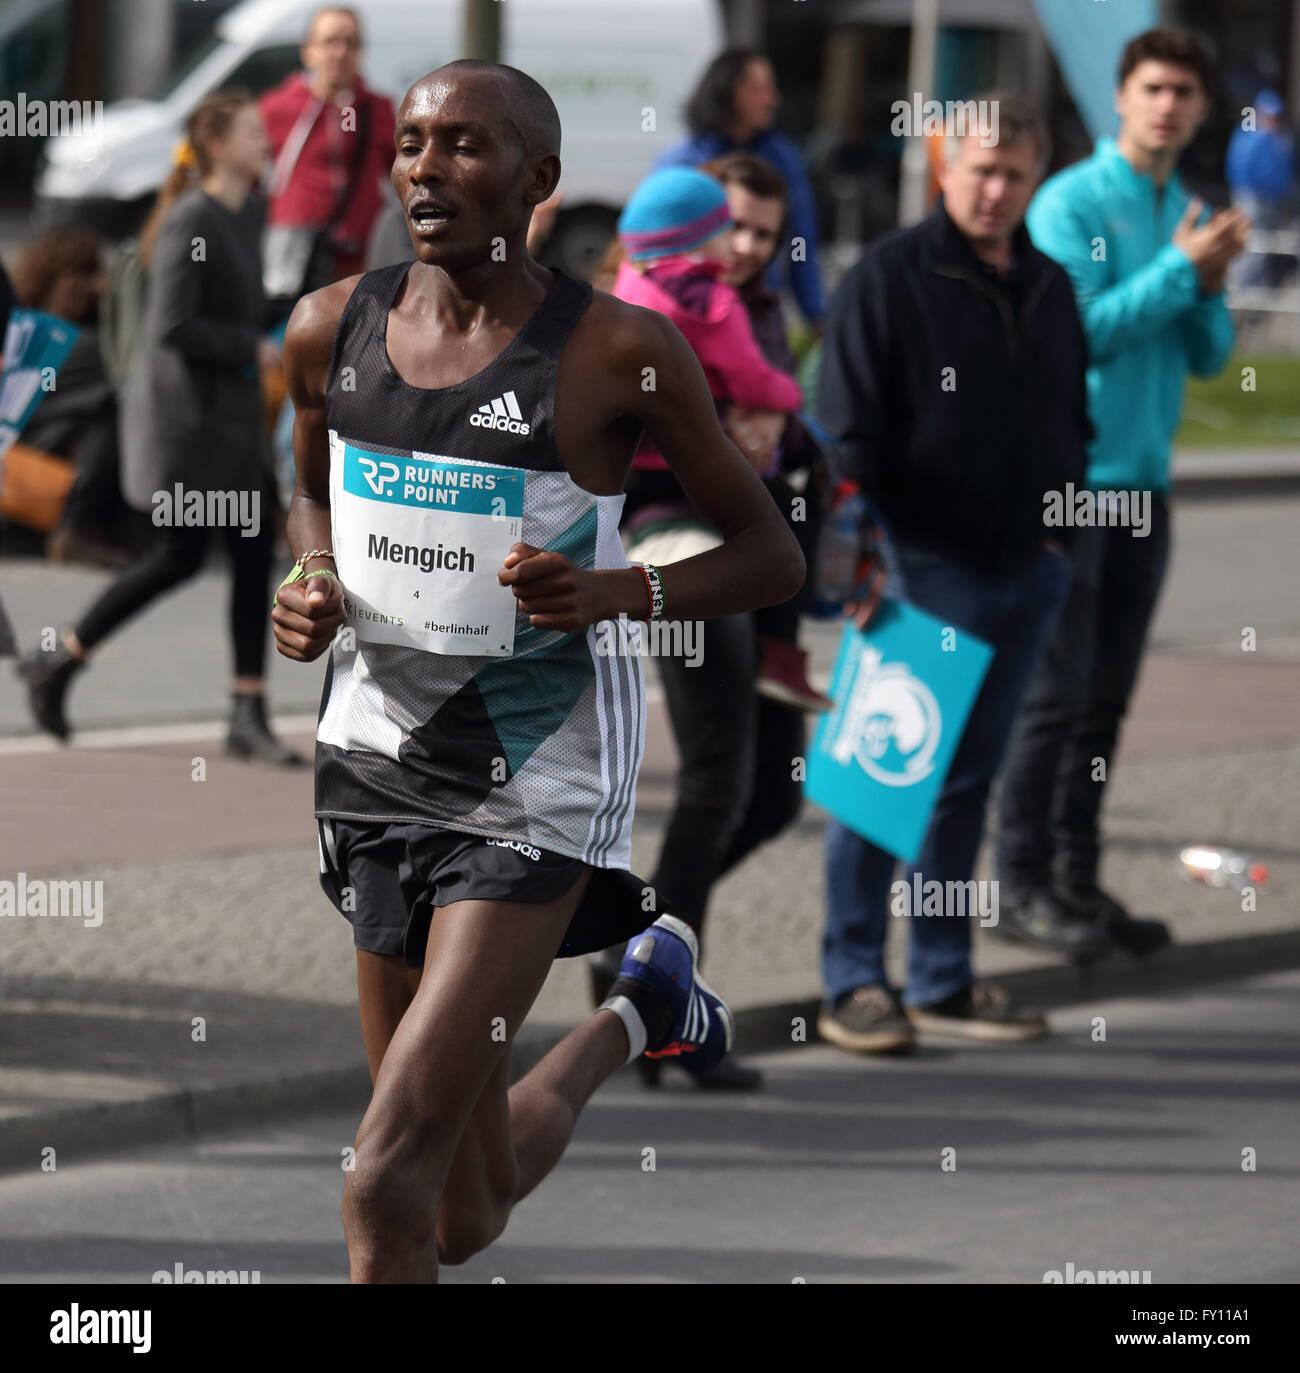 Richard Mengich, eventual winner, in the 2016 Berlin half-marathon near Potsdamer Platz - Stock Image